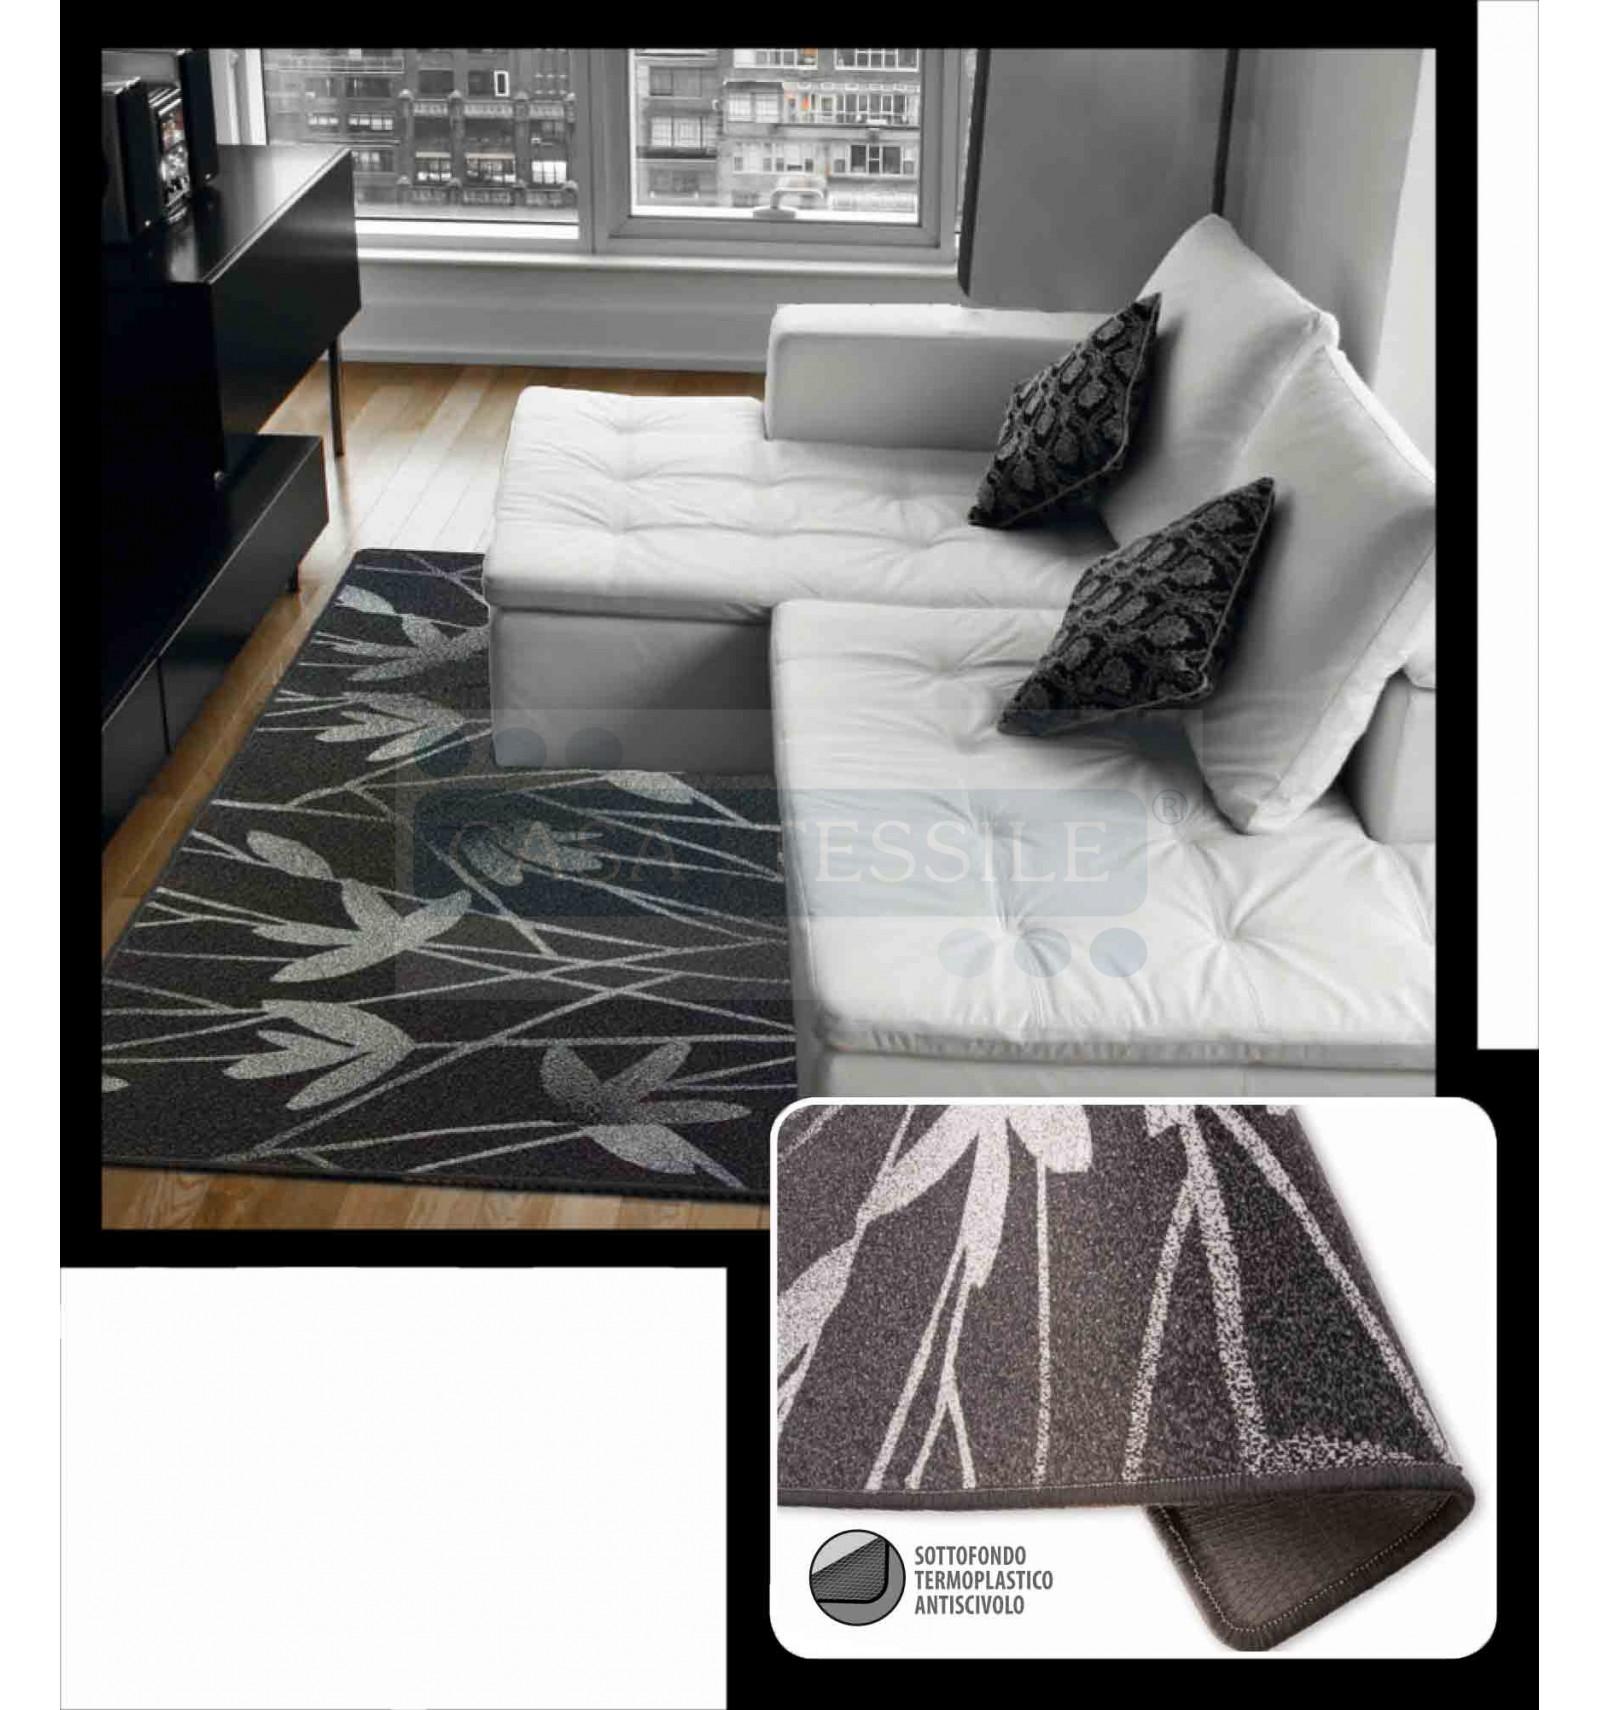 Flo tappeto cucina largo 50 cm casatessile - La cucina di flo ...